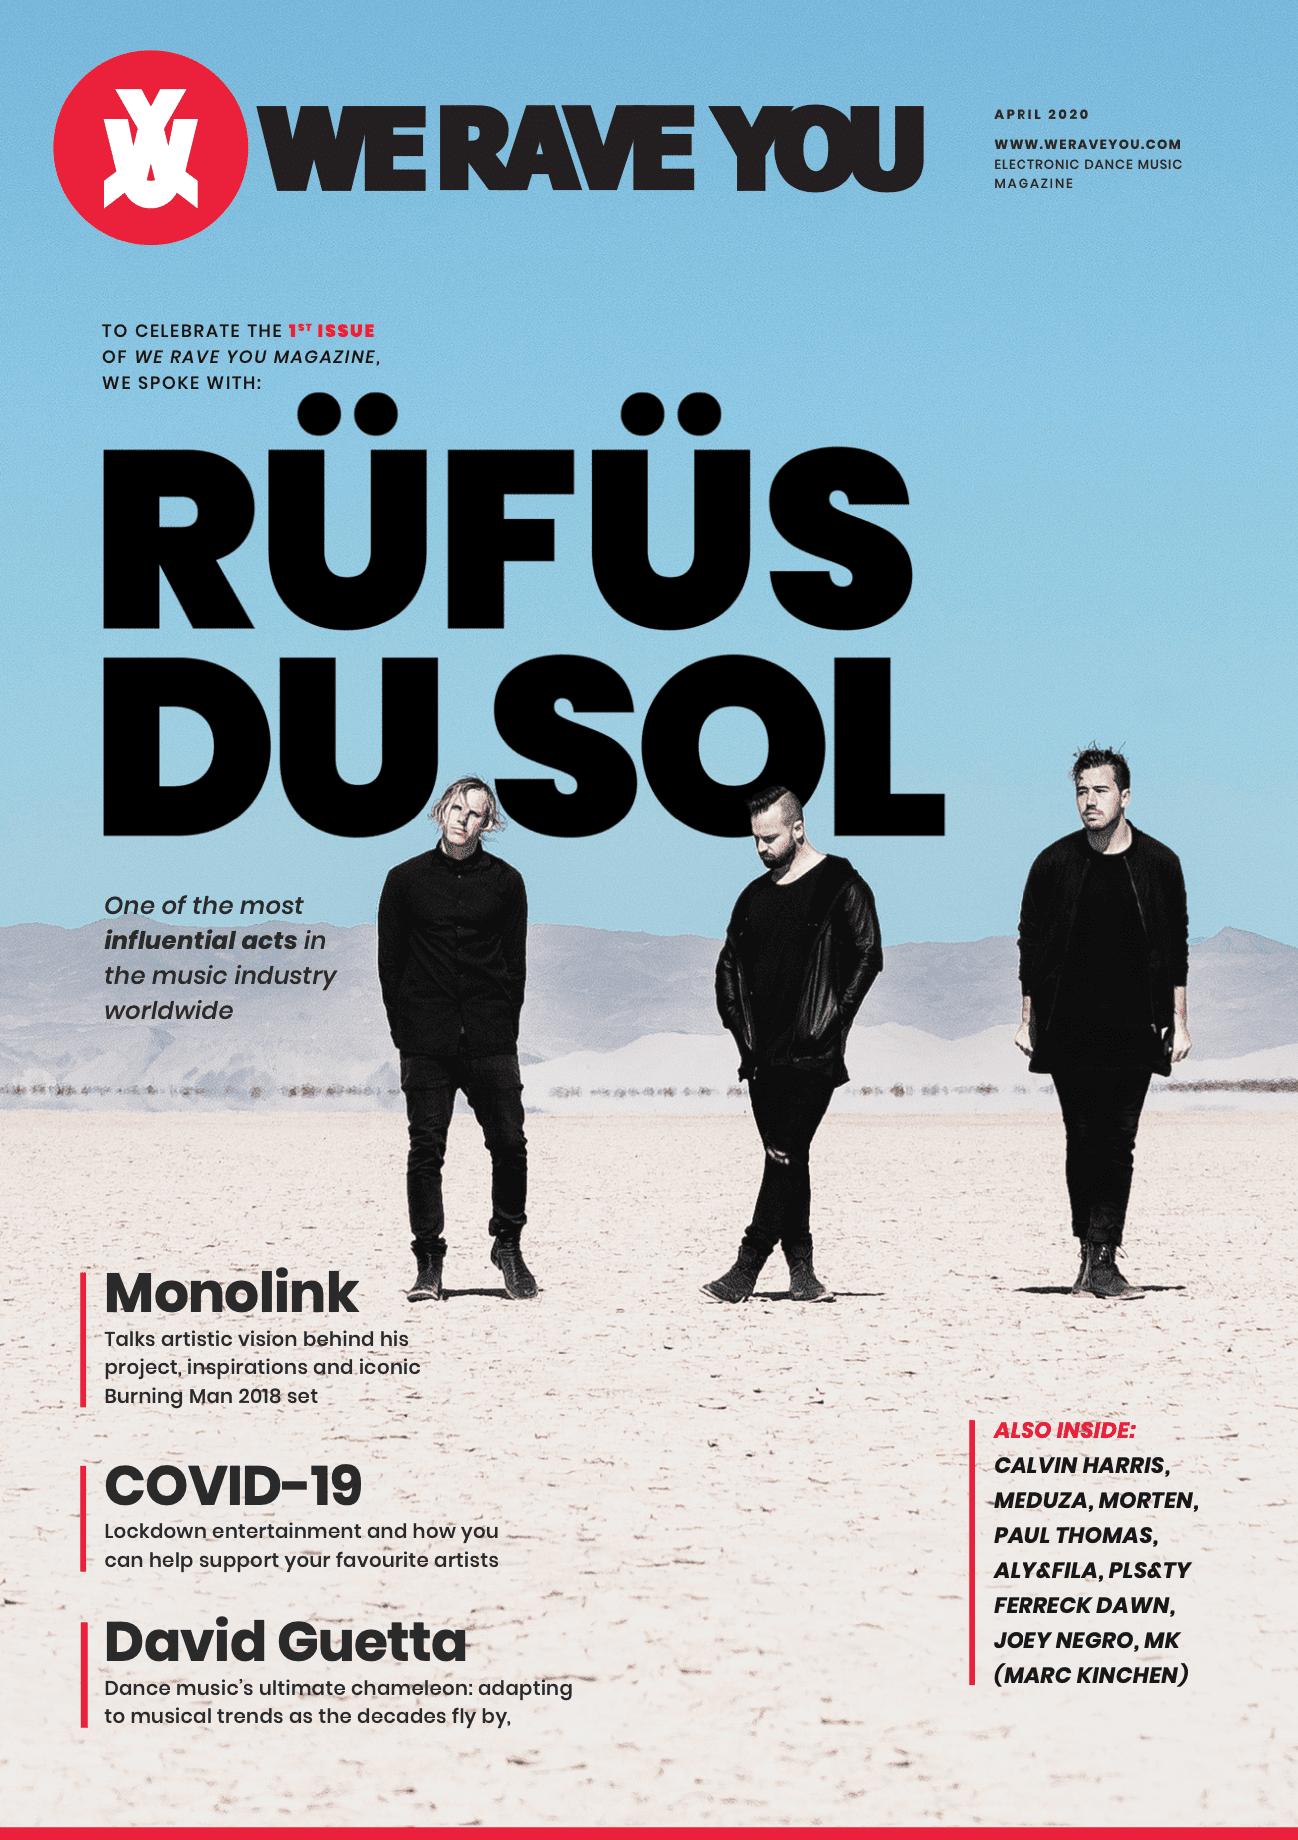 We Rave You Digital Magazine Cover April 2020